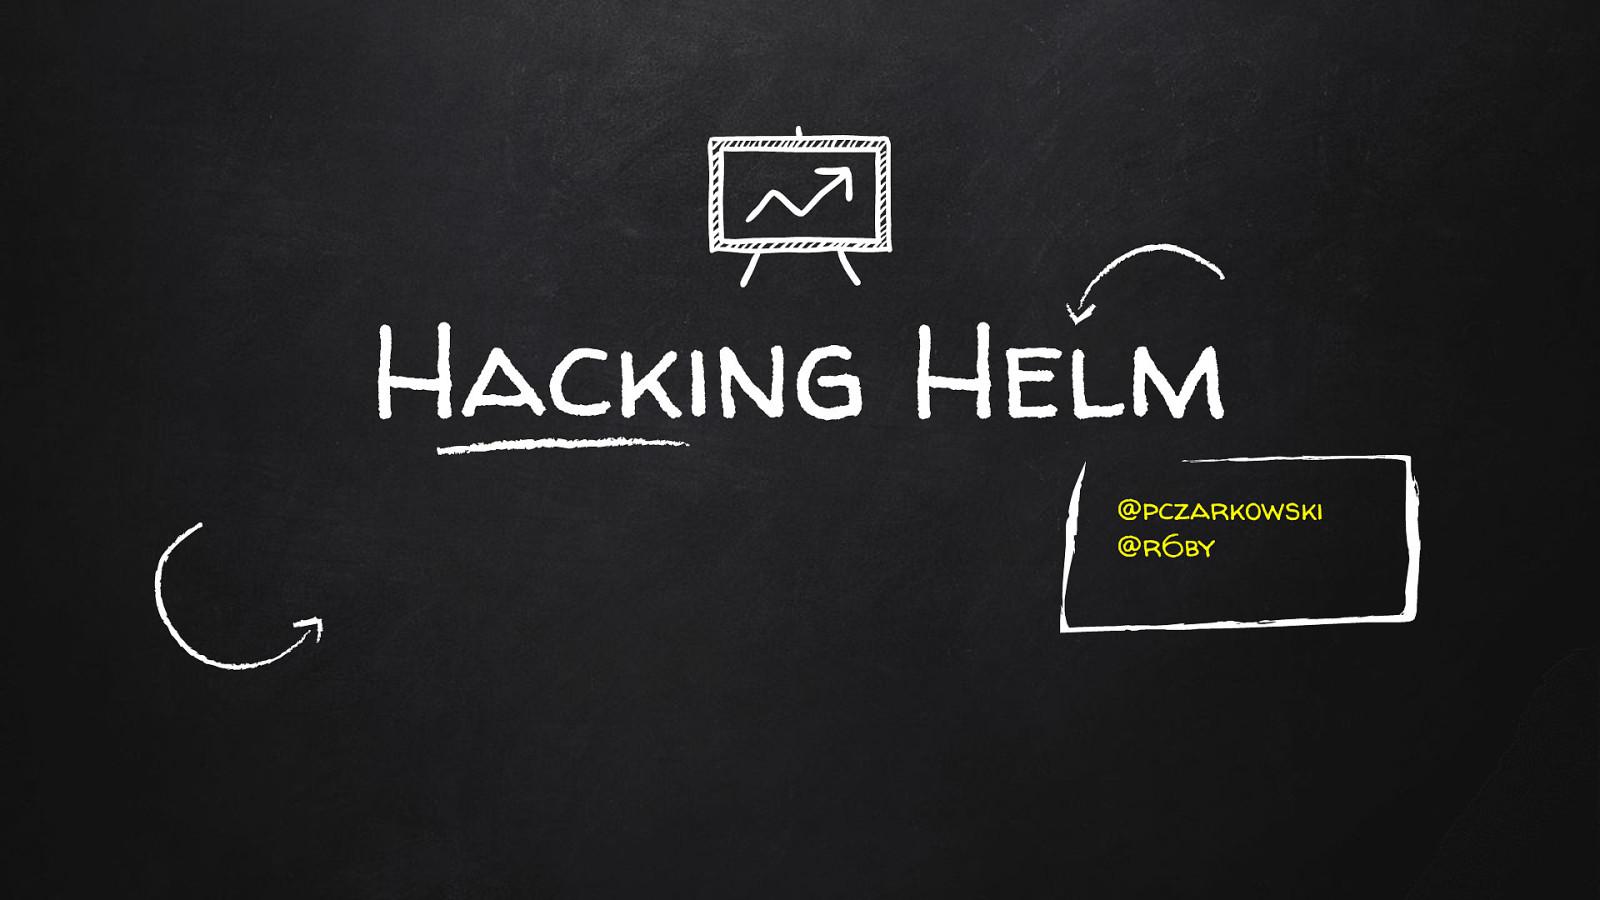 Hacking Helm